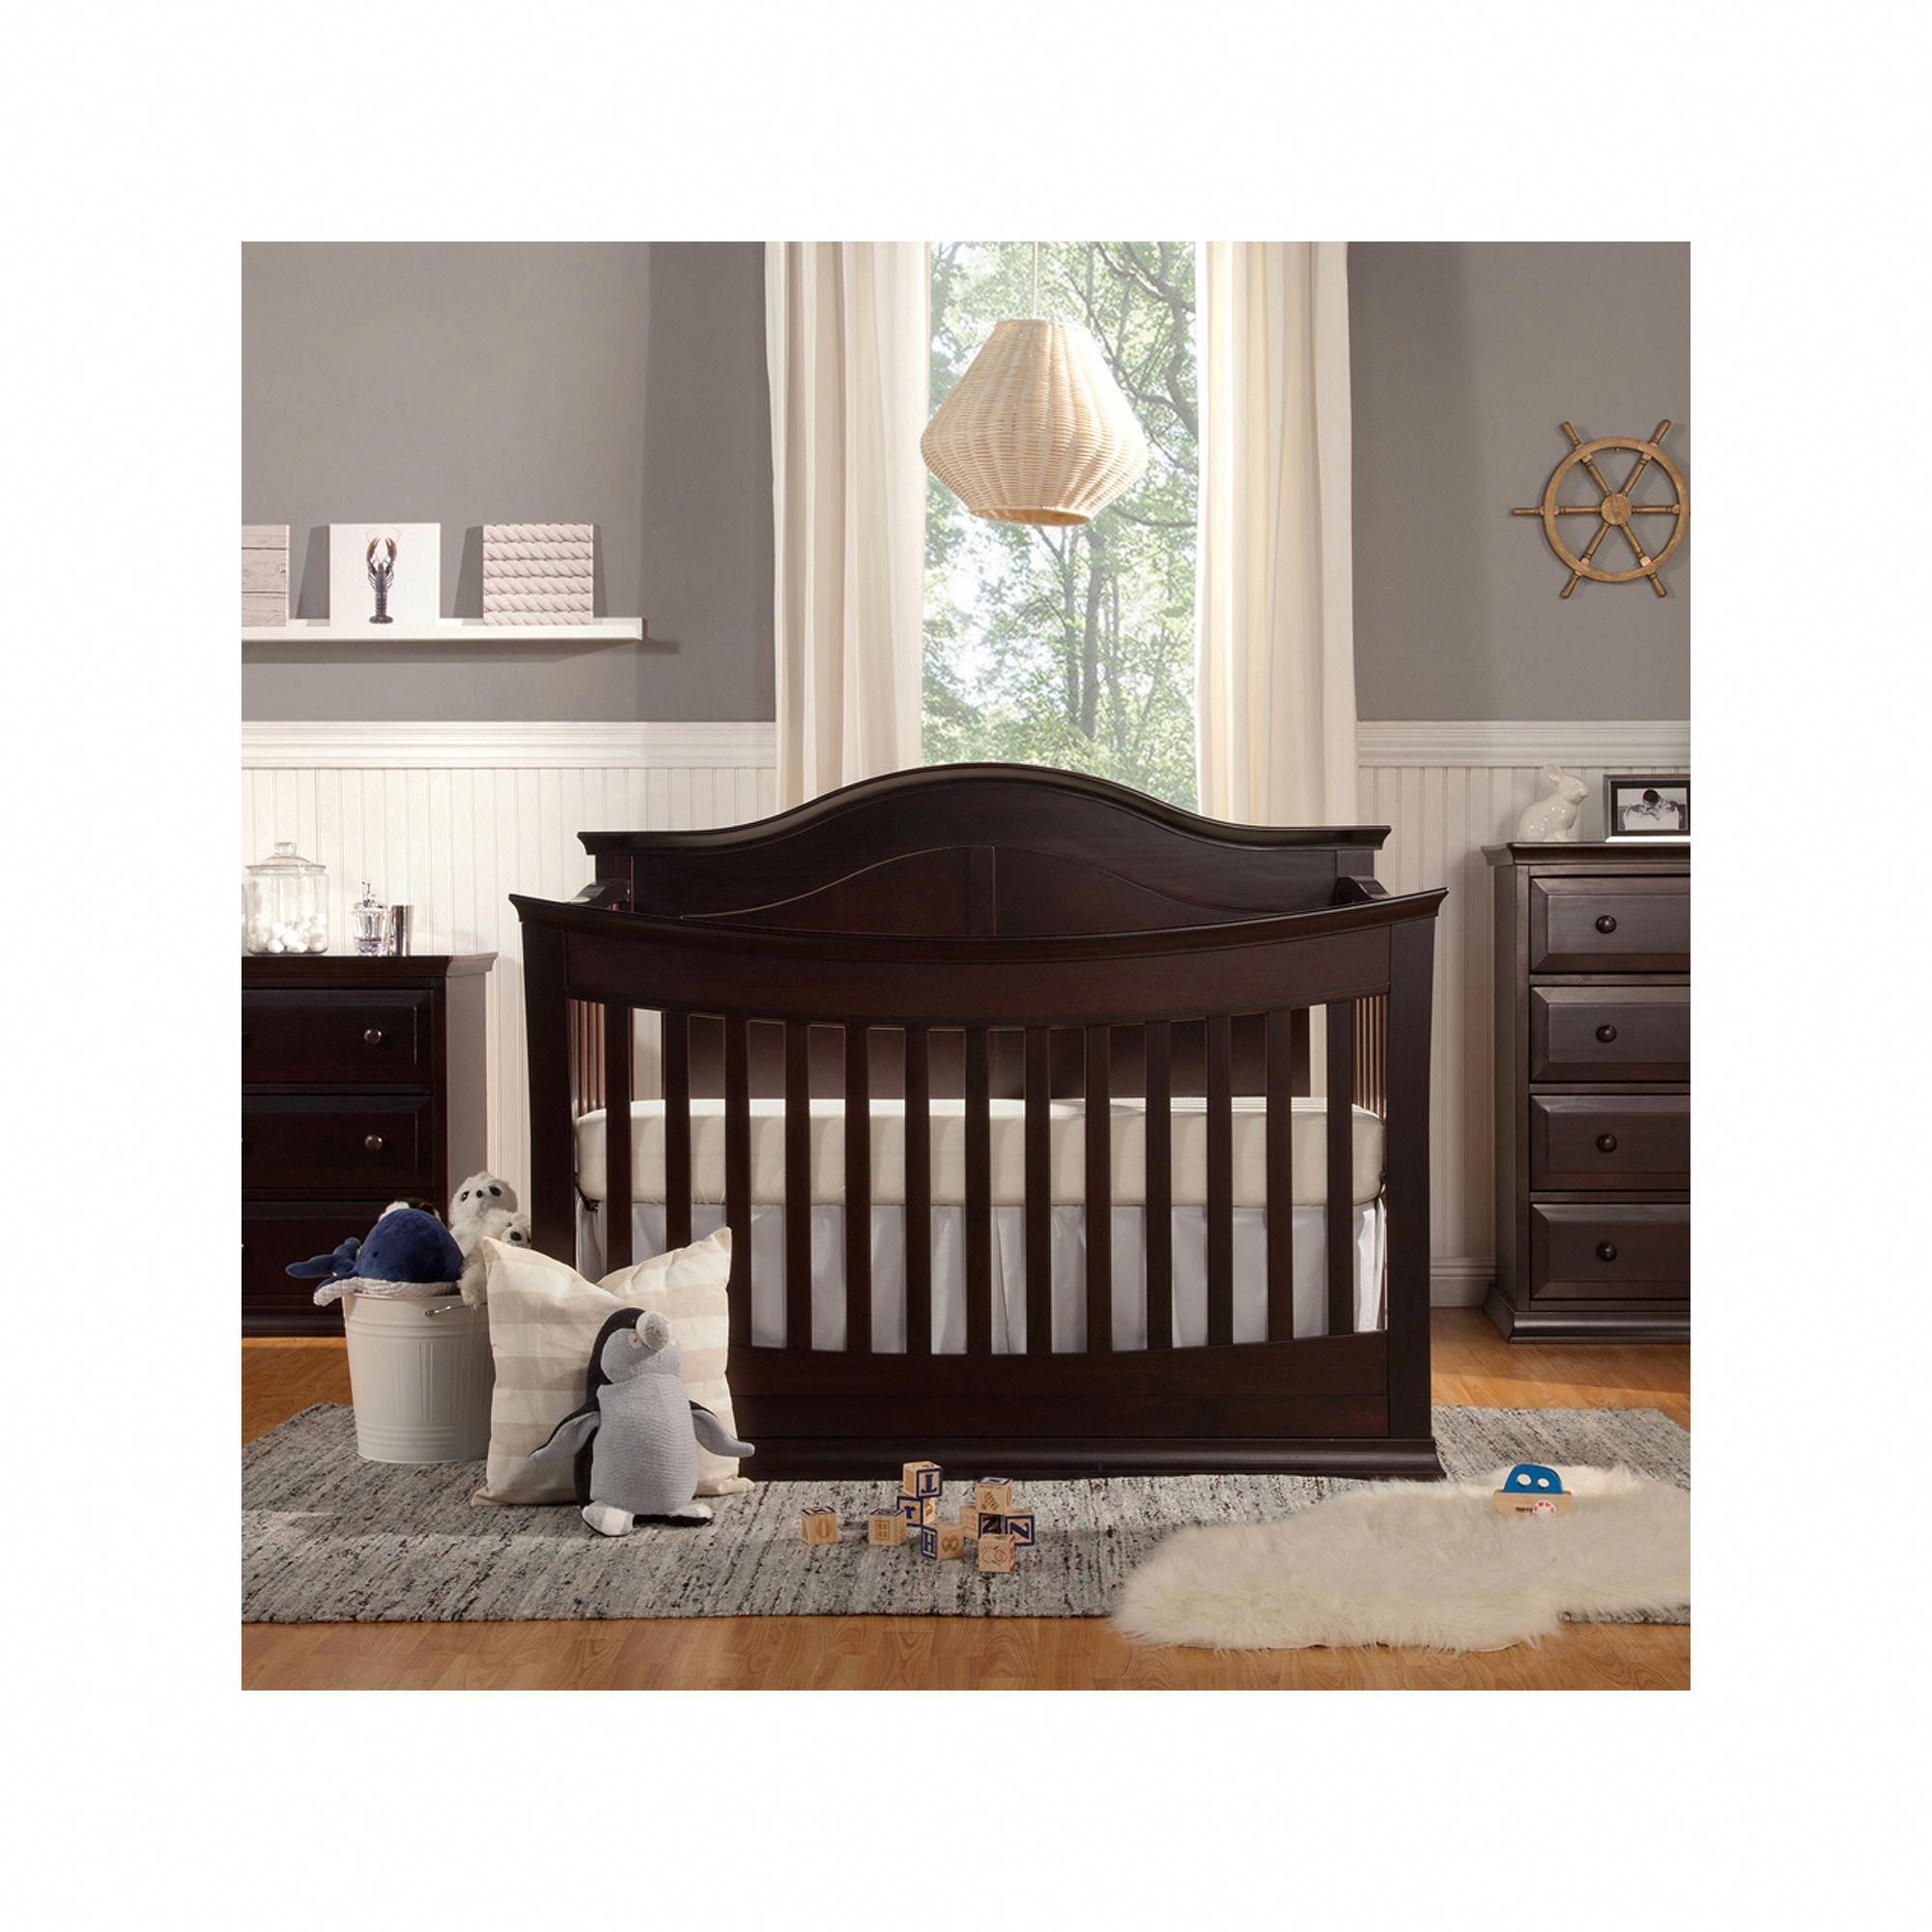 Low cost furniture shipping furnituremadeinusa info 8655352675 contemporaryfurniture